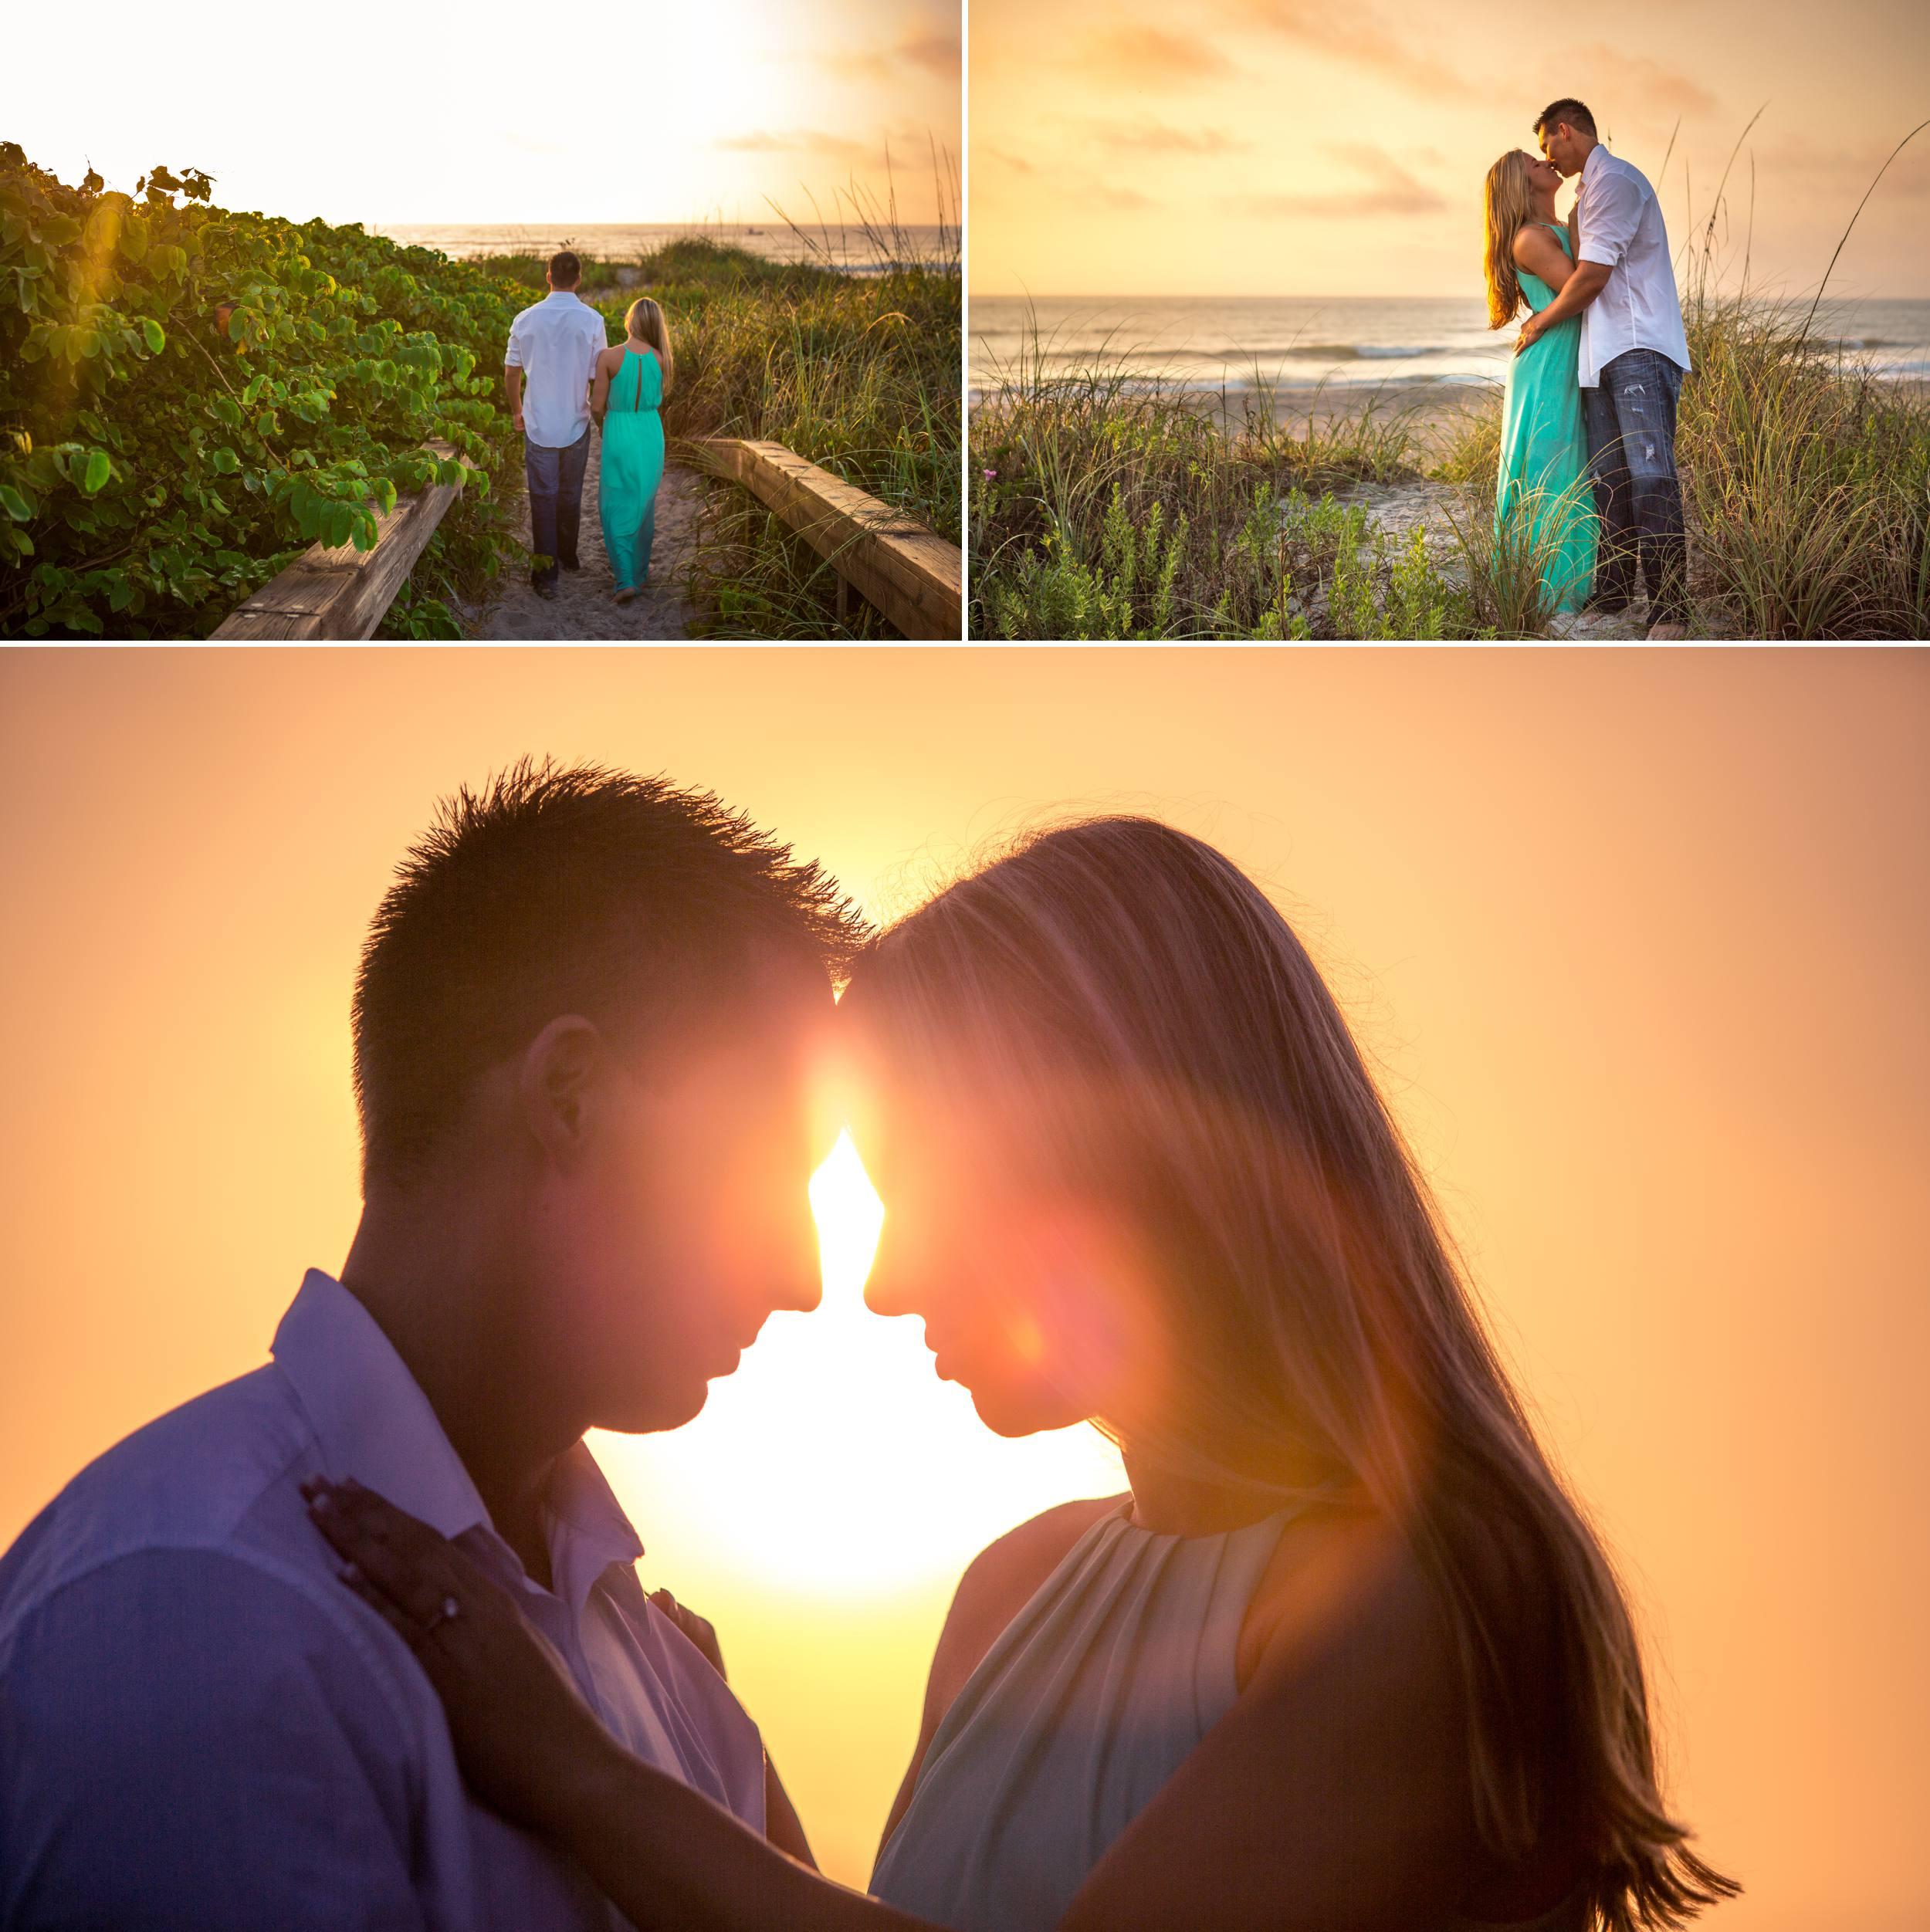 Lori Wilson Park Cocoa Beach Sunrise Engagement Session Mint Green dress- Bri 9.jpg